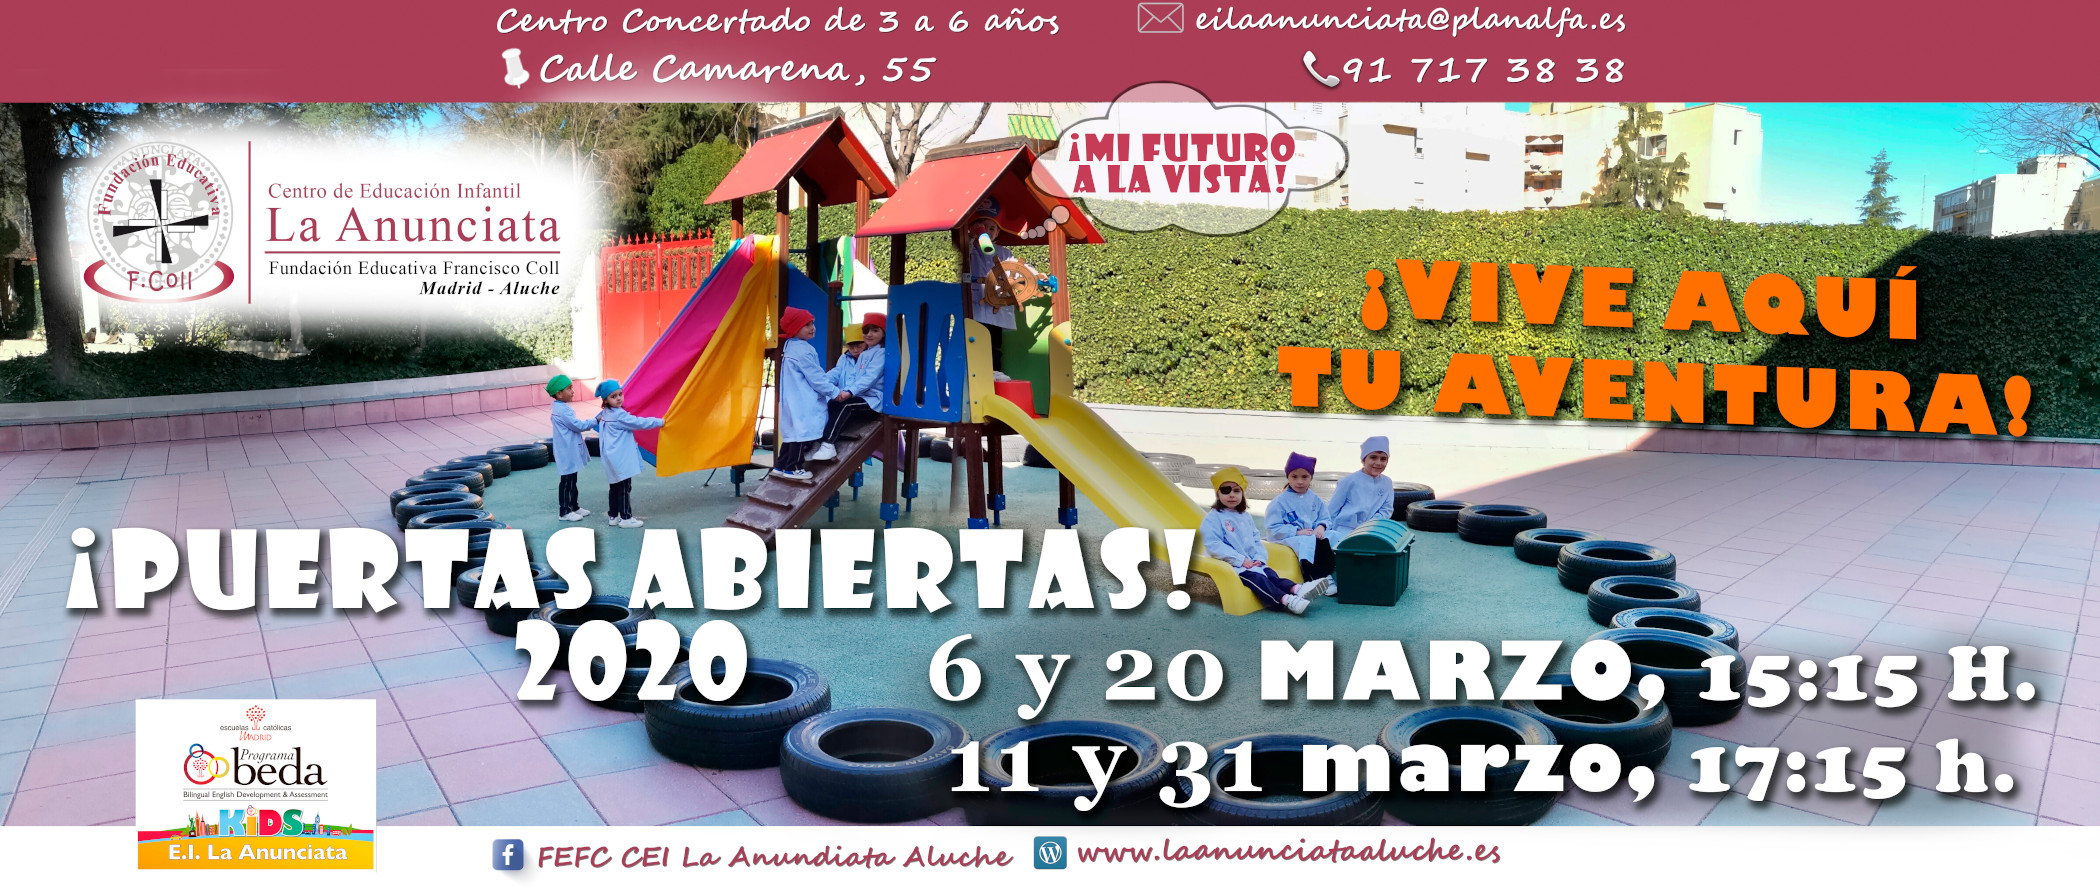 cabecera_web_200226